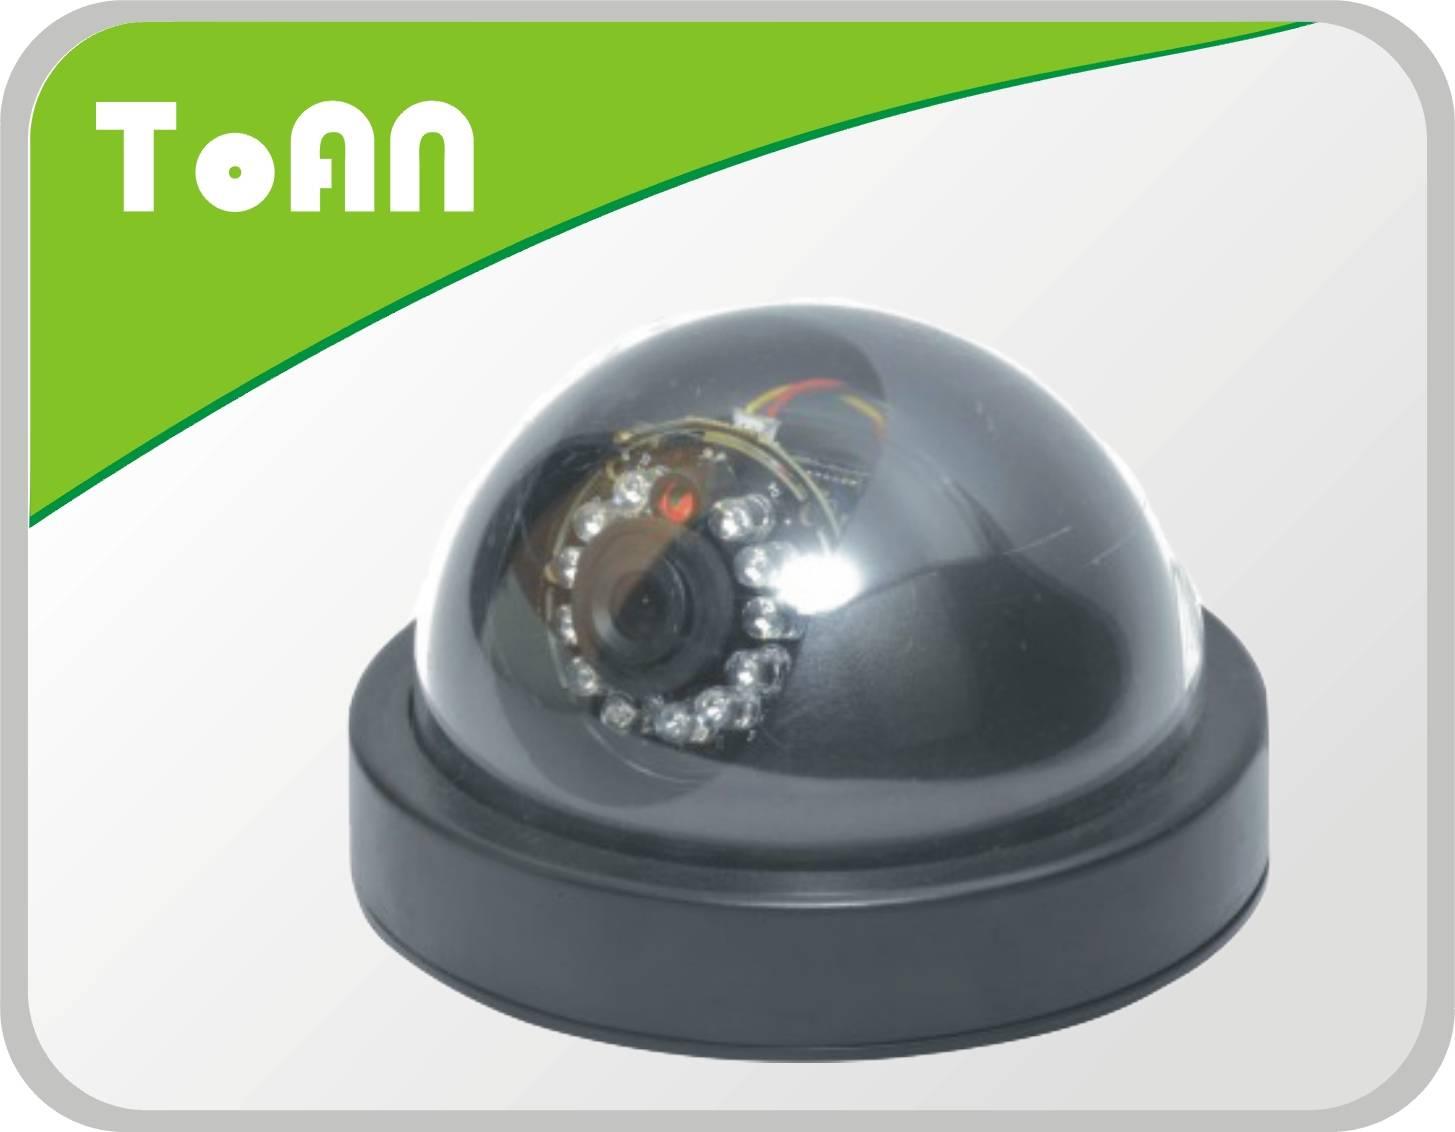 TOAN HOTSALE Popular Design cctv mirror dome camera low price cctv dome camera cheap mirror dome cam